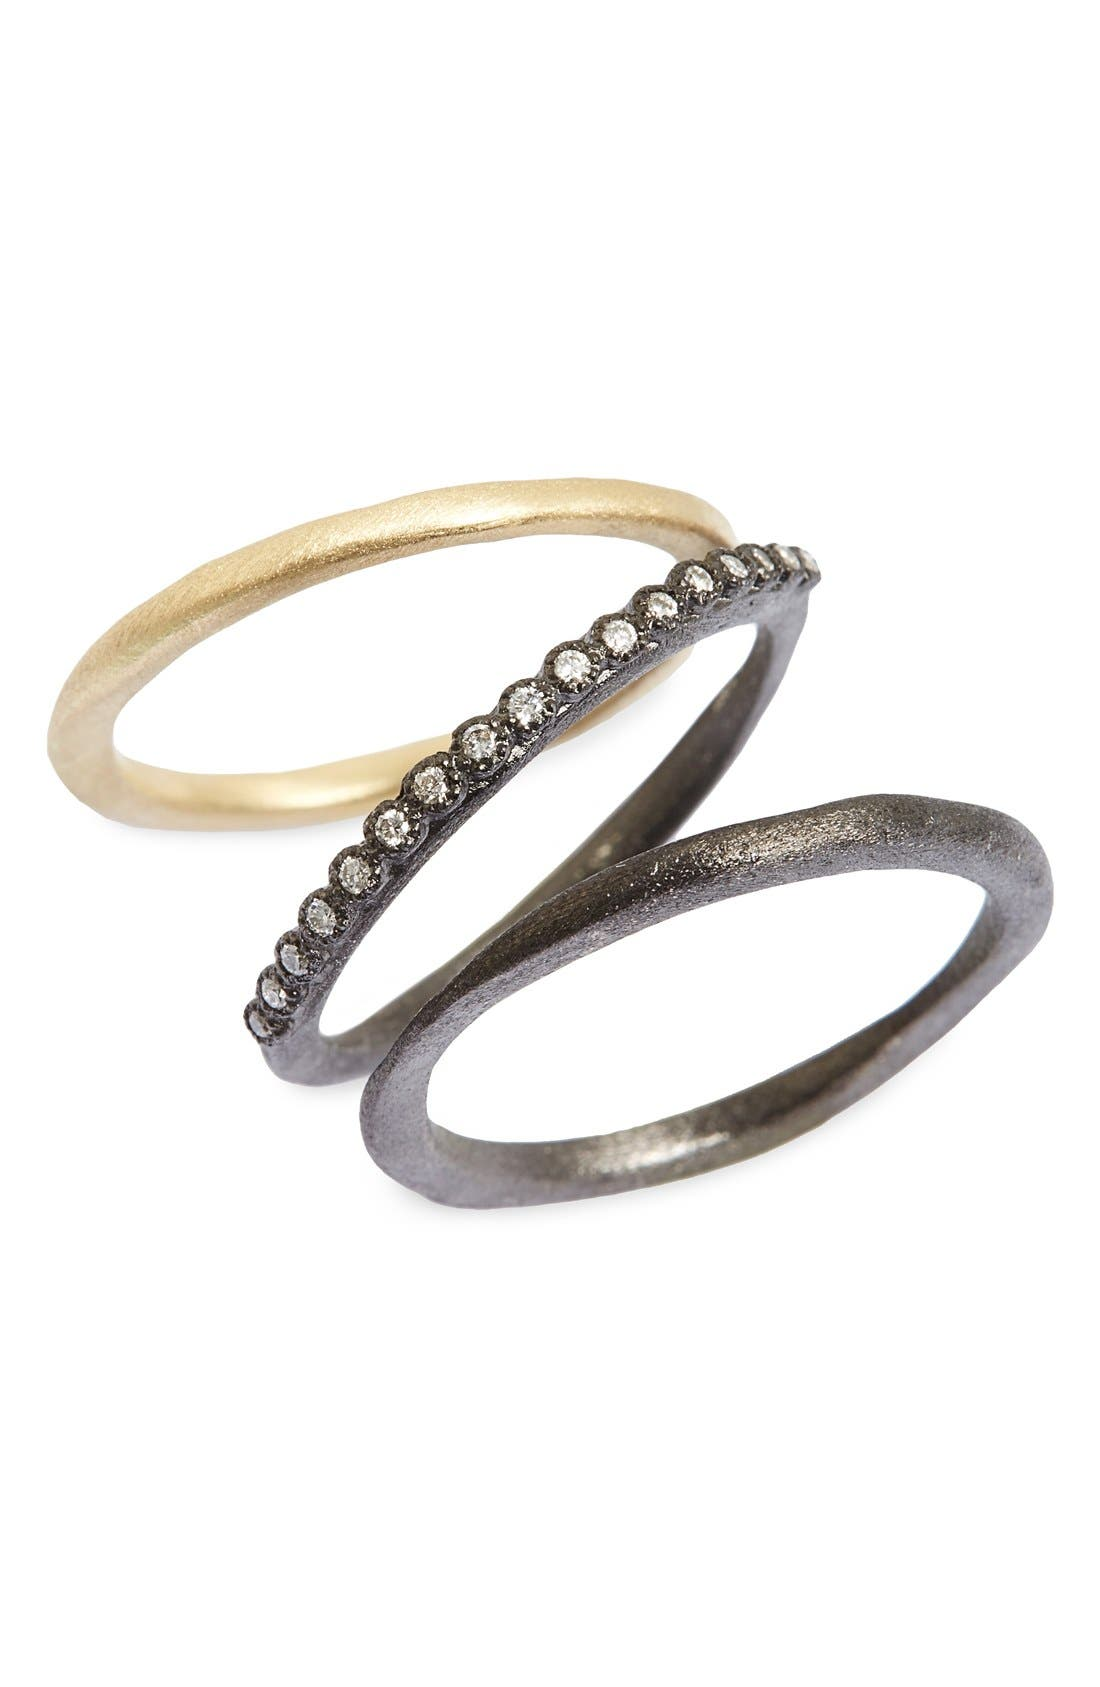 Main Image - Armenta Old World Diamond Stacking Rings (Set of 3)